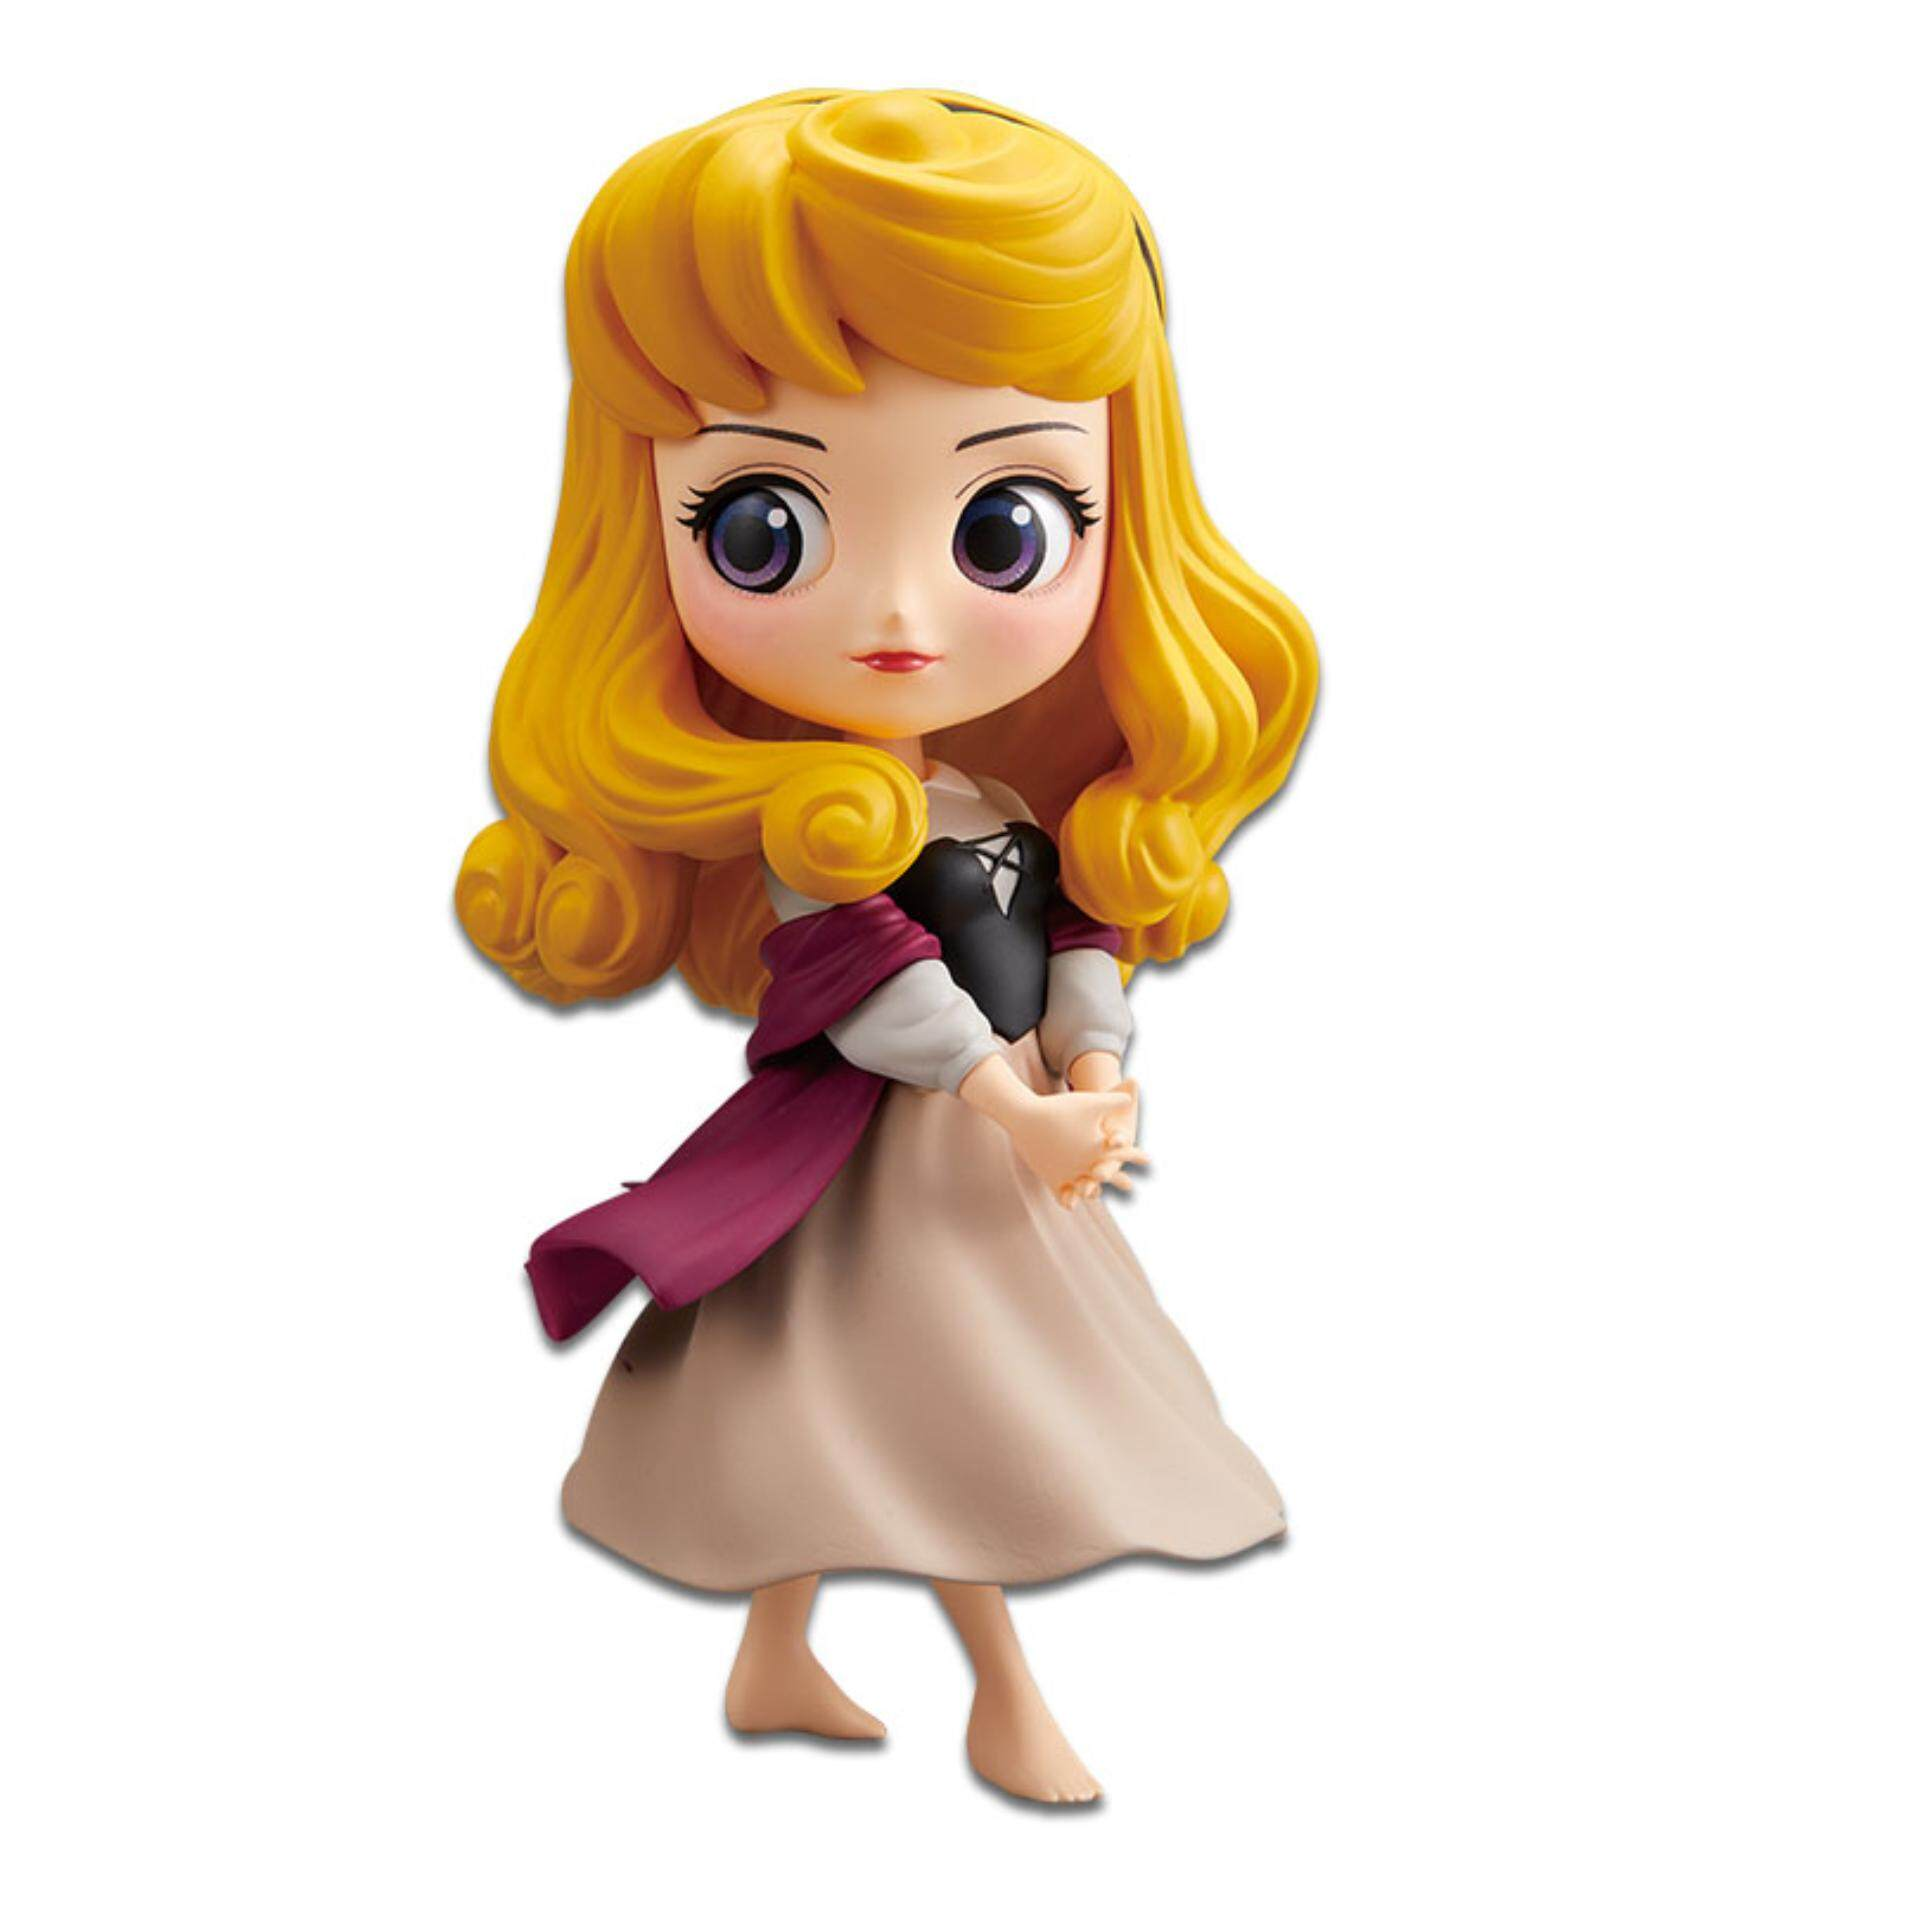 Banpresto Q Posket Disney Princess Figure Normal Version - Briar Rose (Aurora) Toys for boys